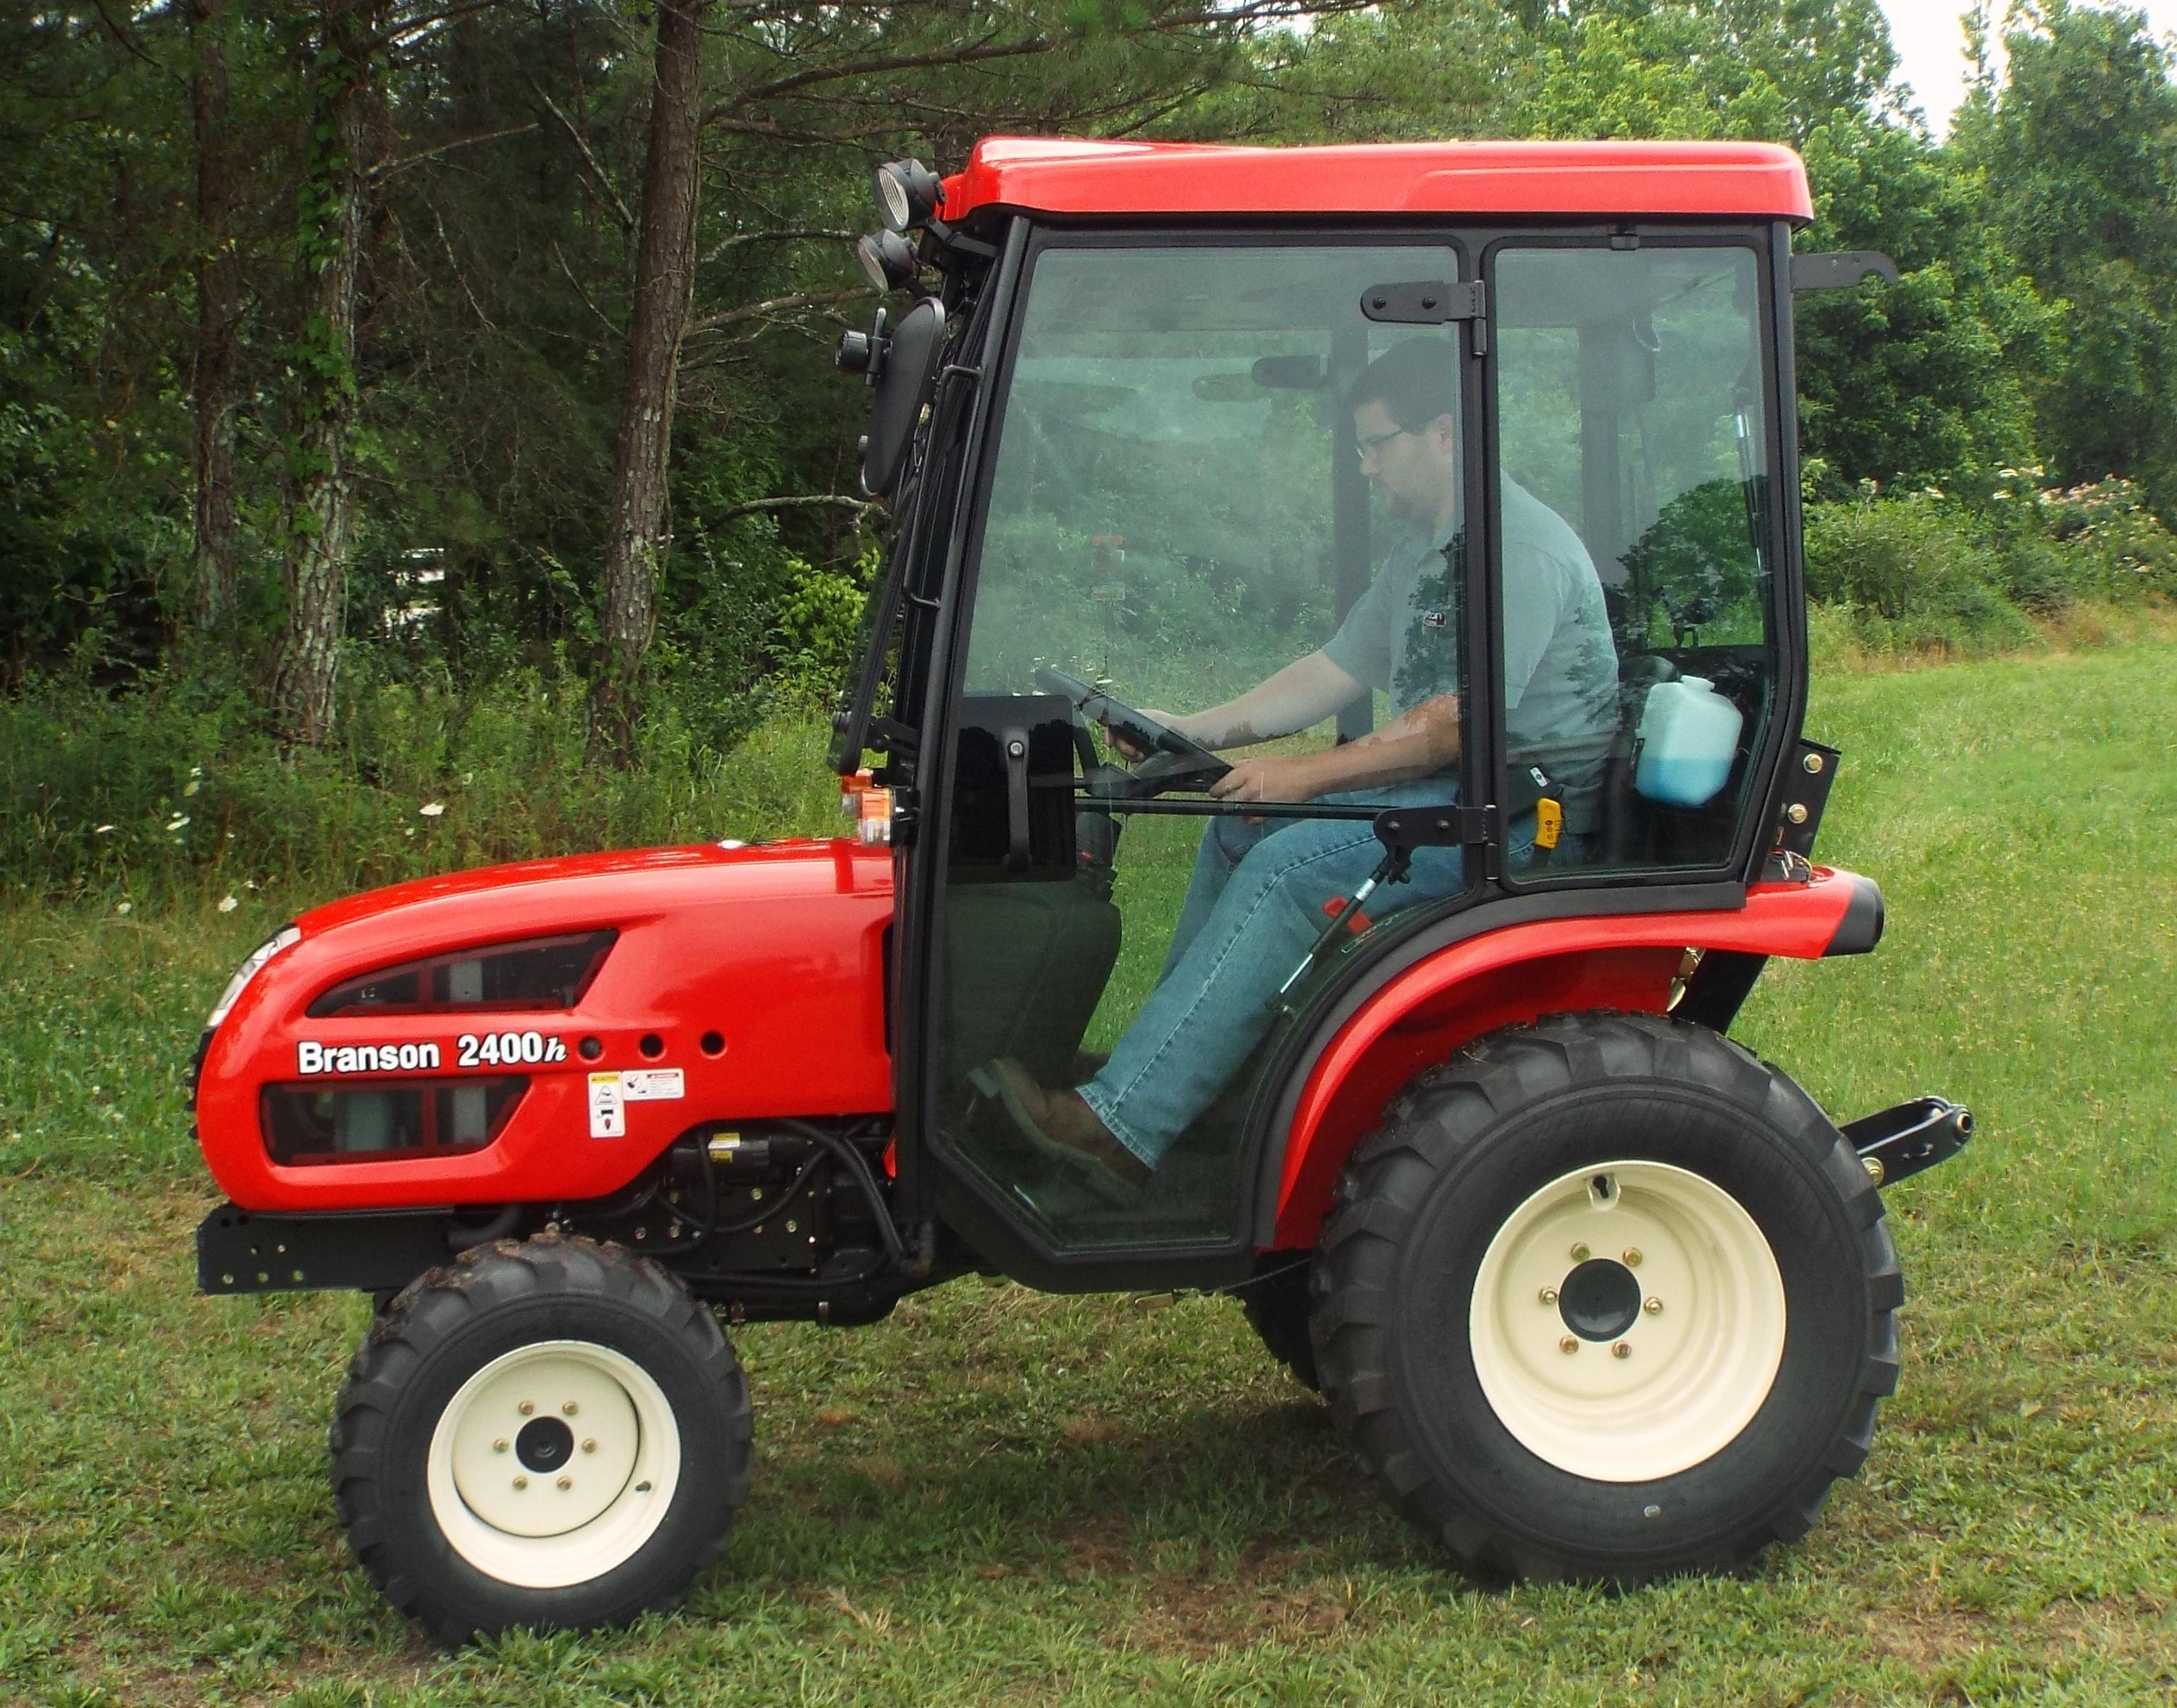 Branson Tractor 2400h